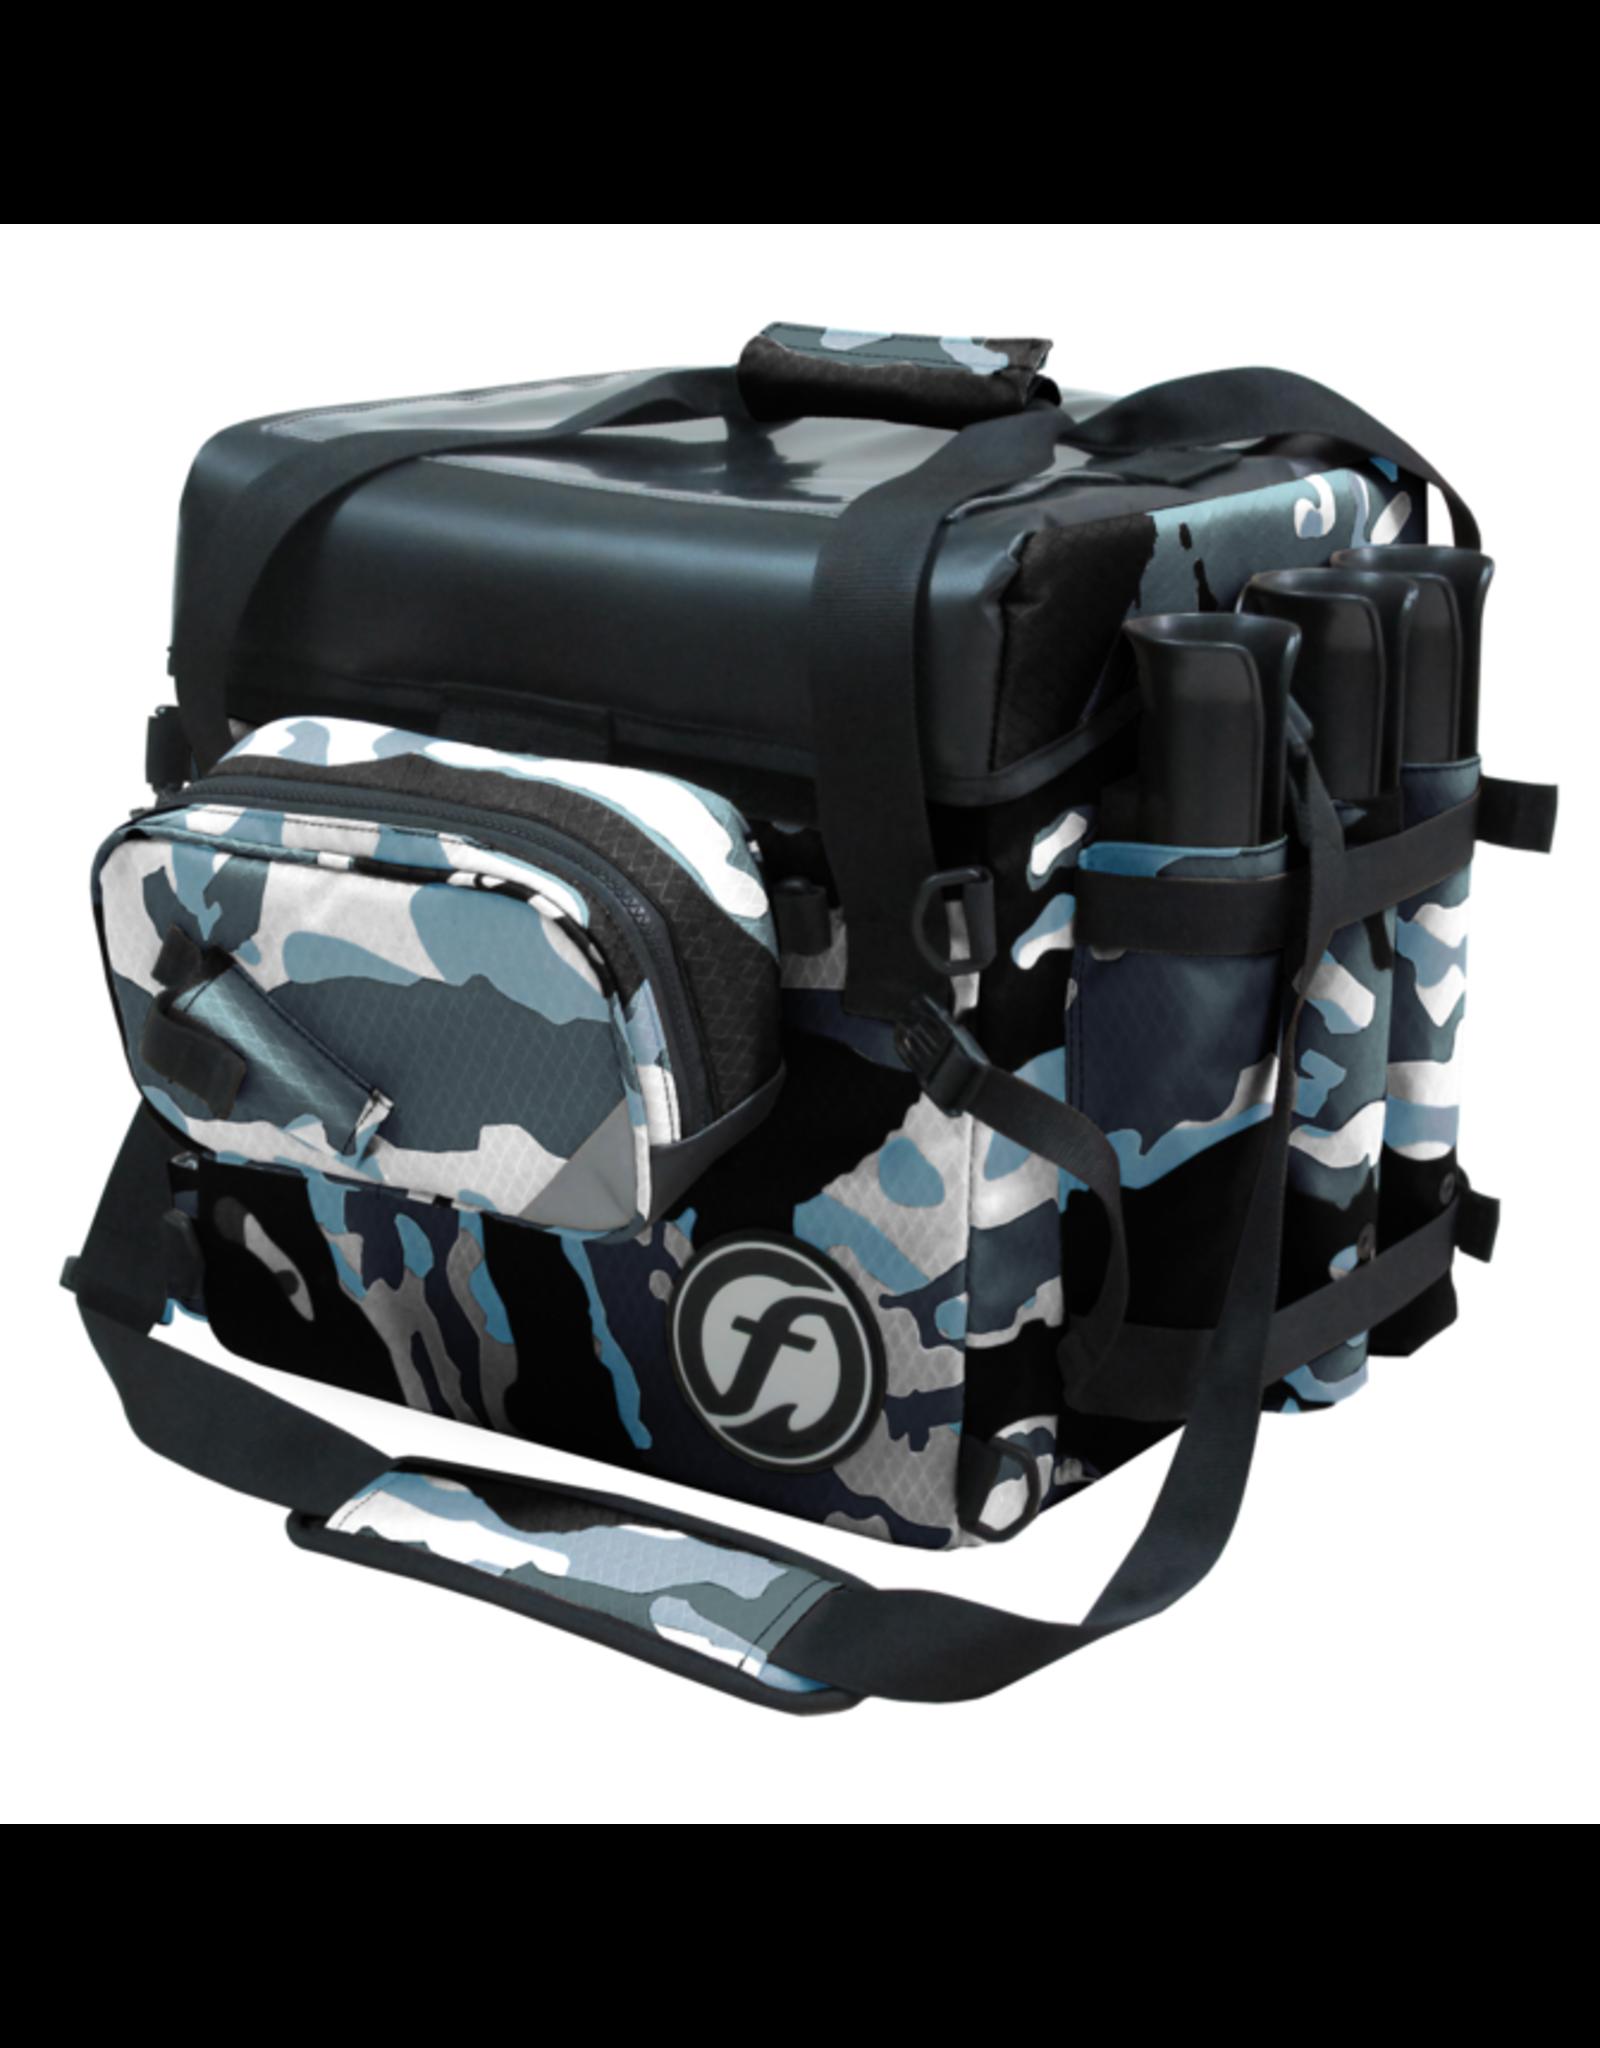 Feelfree Kayaks Feelfree Acc. Sac de rangement Camo Crate Bag